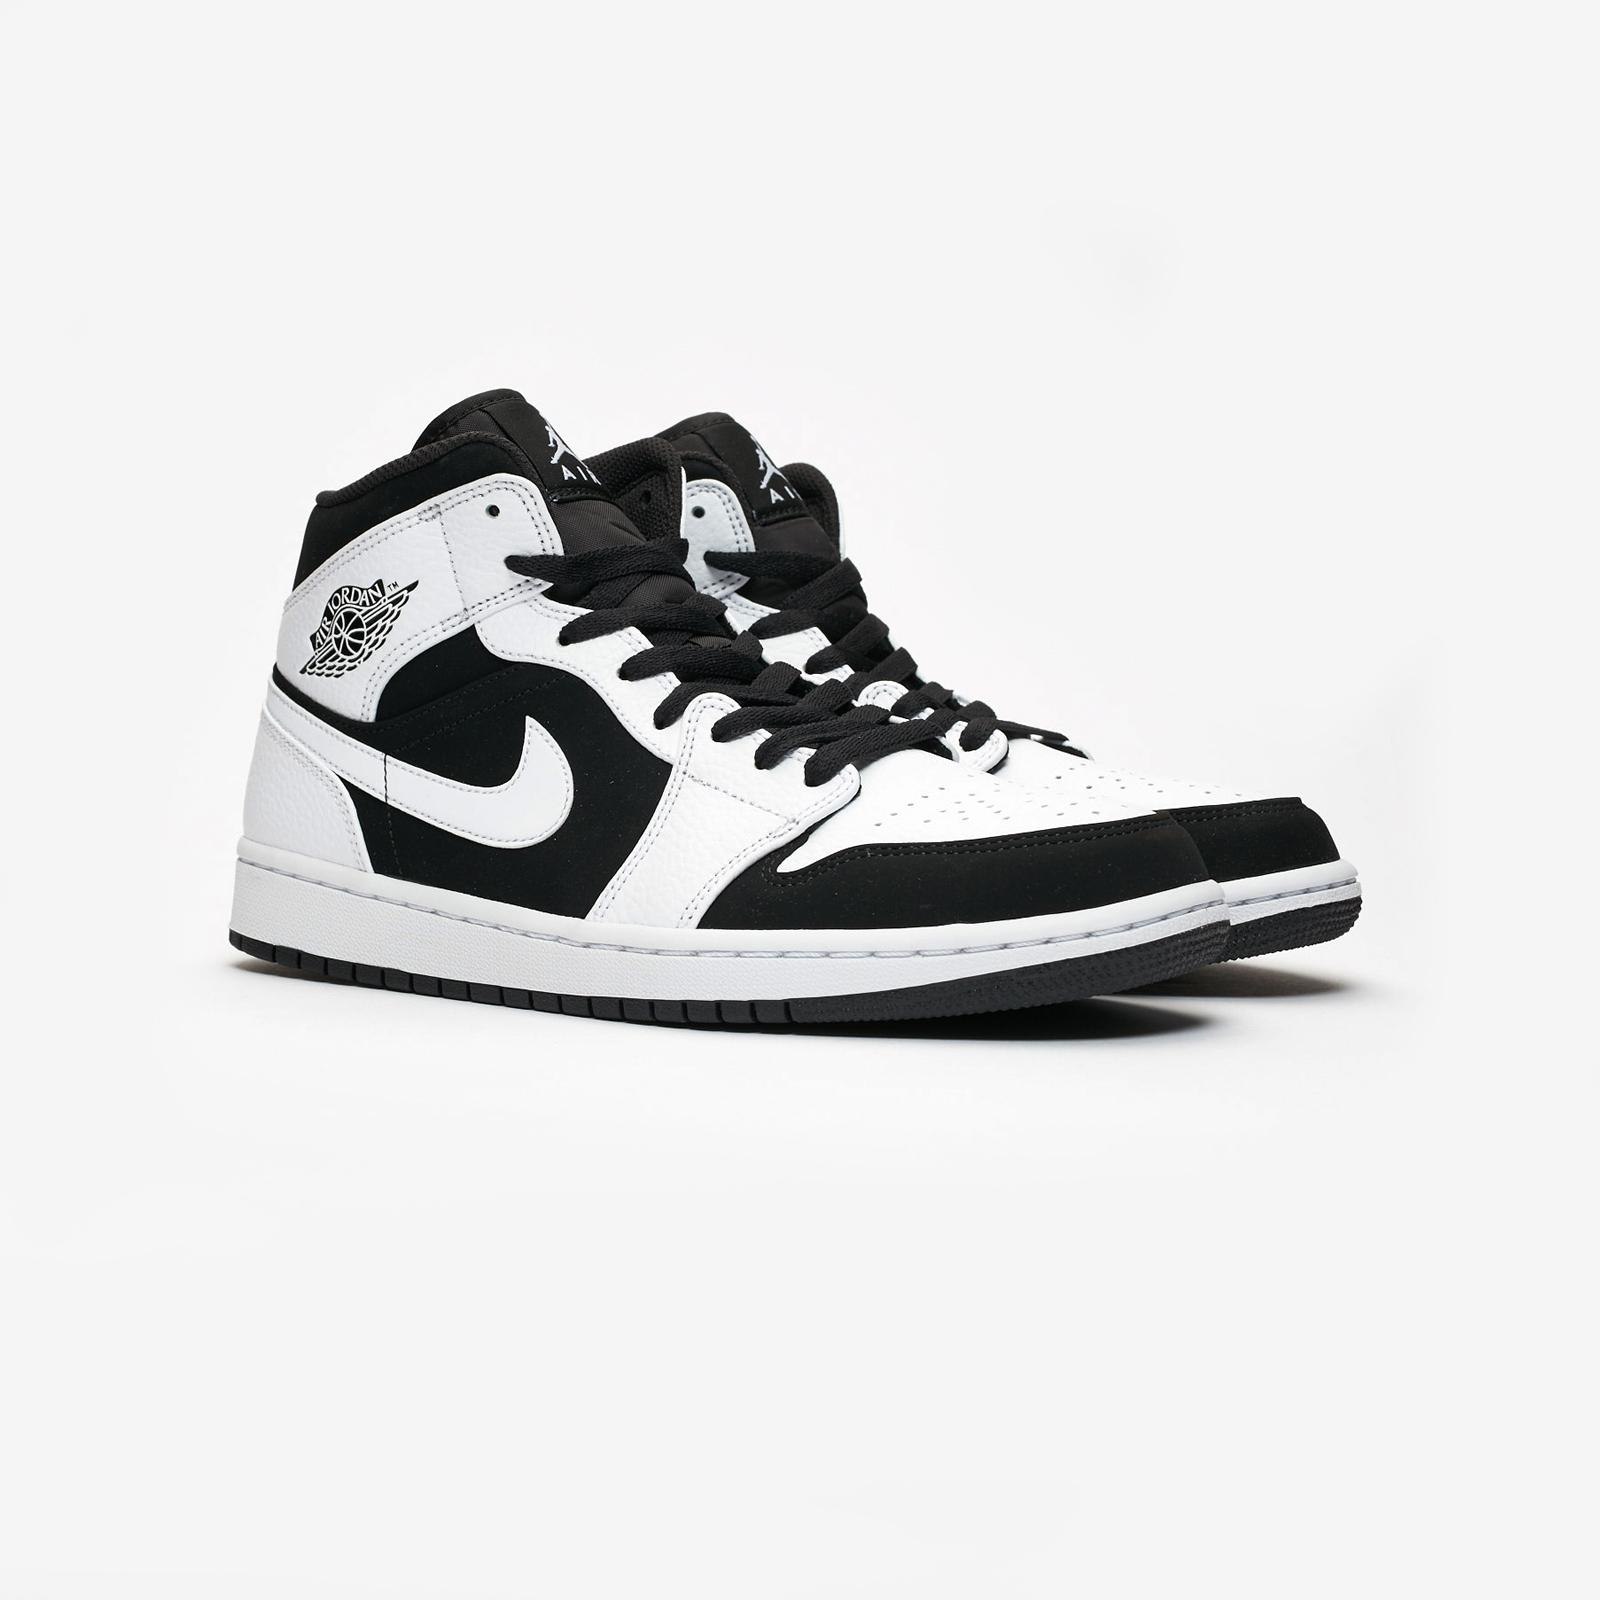 d98302368057ed Jordan Brand Air Jordan 1 Mid - 554724-113 - Sneakersnstuff ...